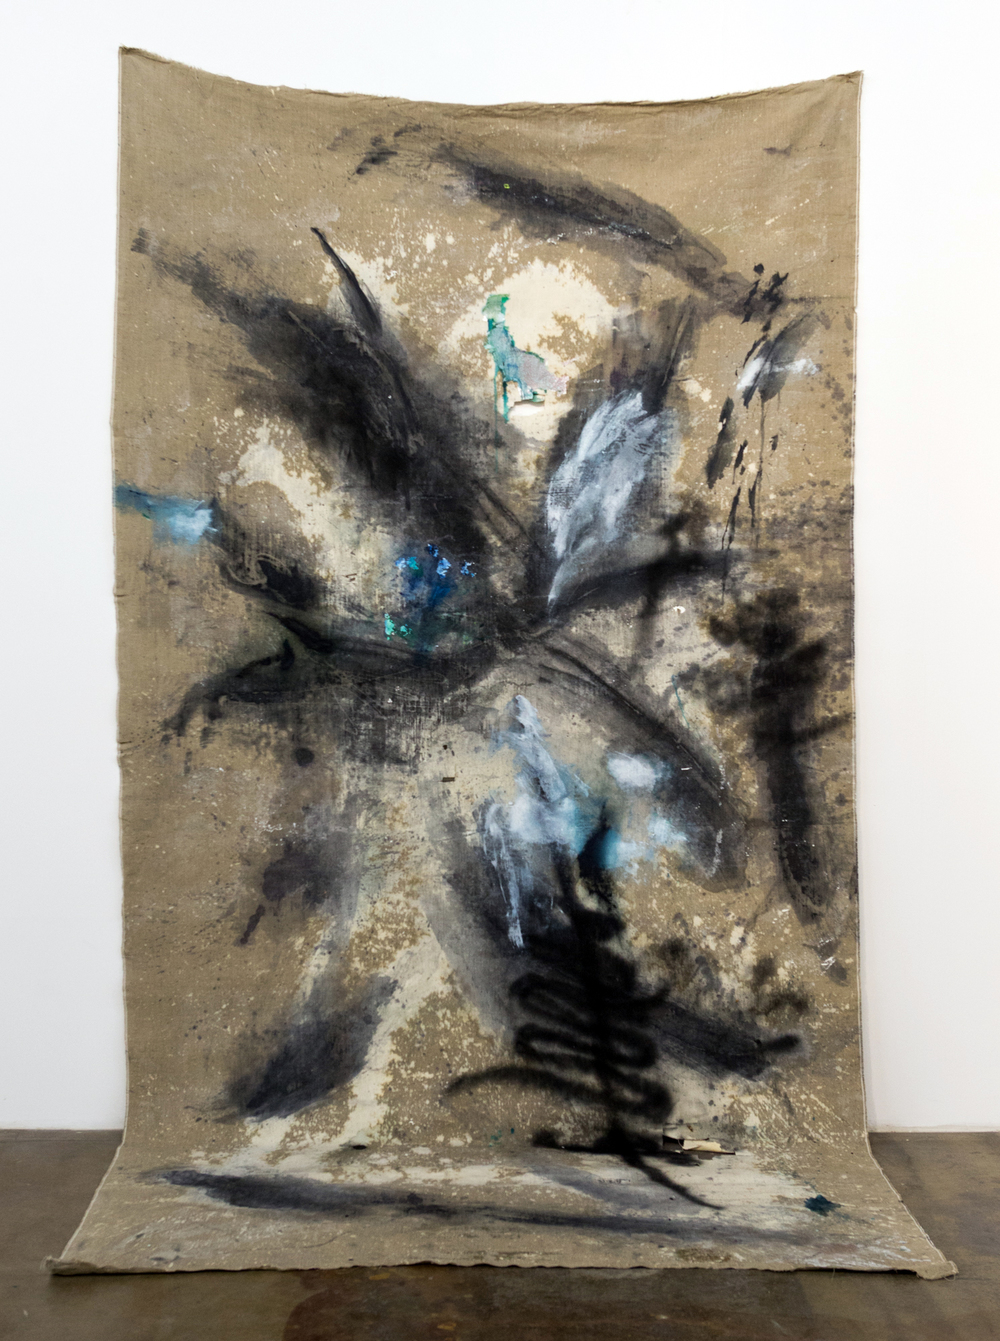 MLSL_05_Malice, 2015 Oil, acrylic, bleach, drywall, lead and spray paint on linen 135 x 71.5 in (342.9 x 181.61 cm)